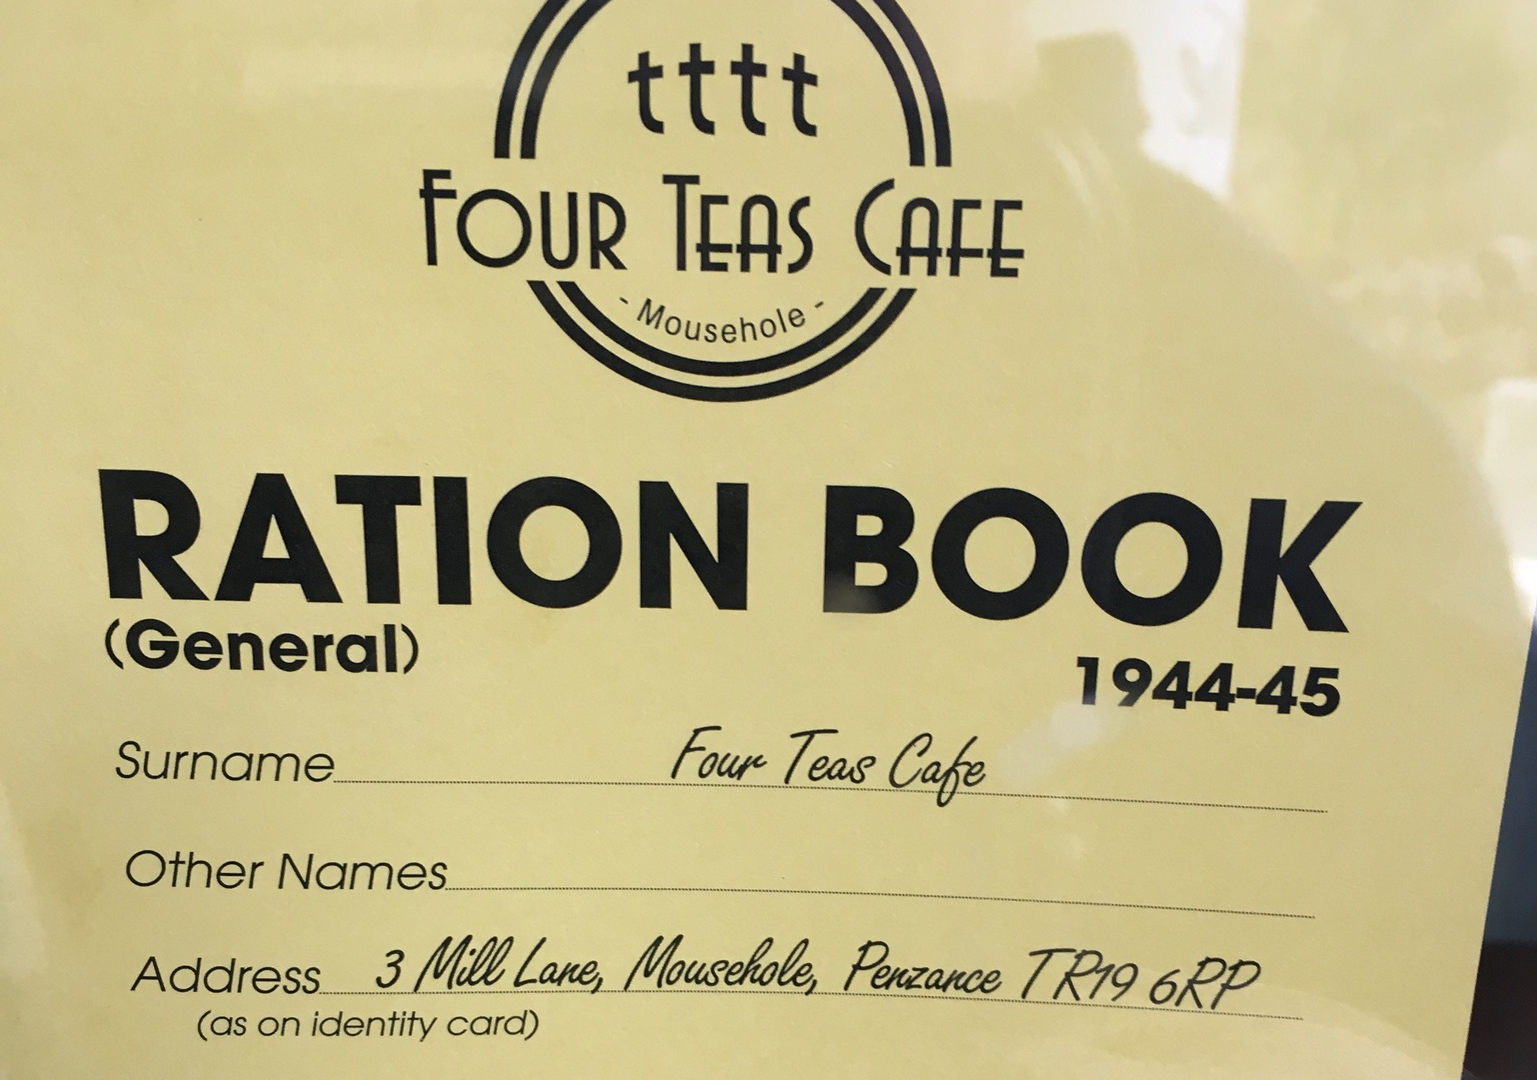 Four Teas Cafe Mousehole Menu Photograph